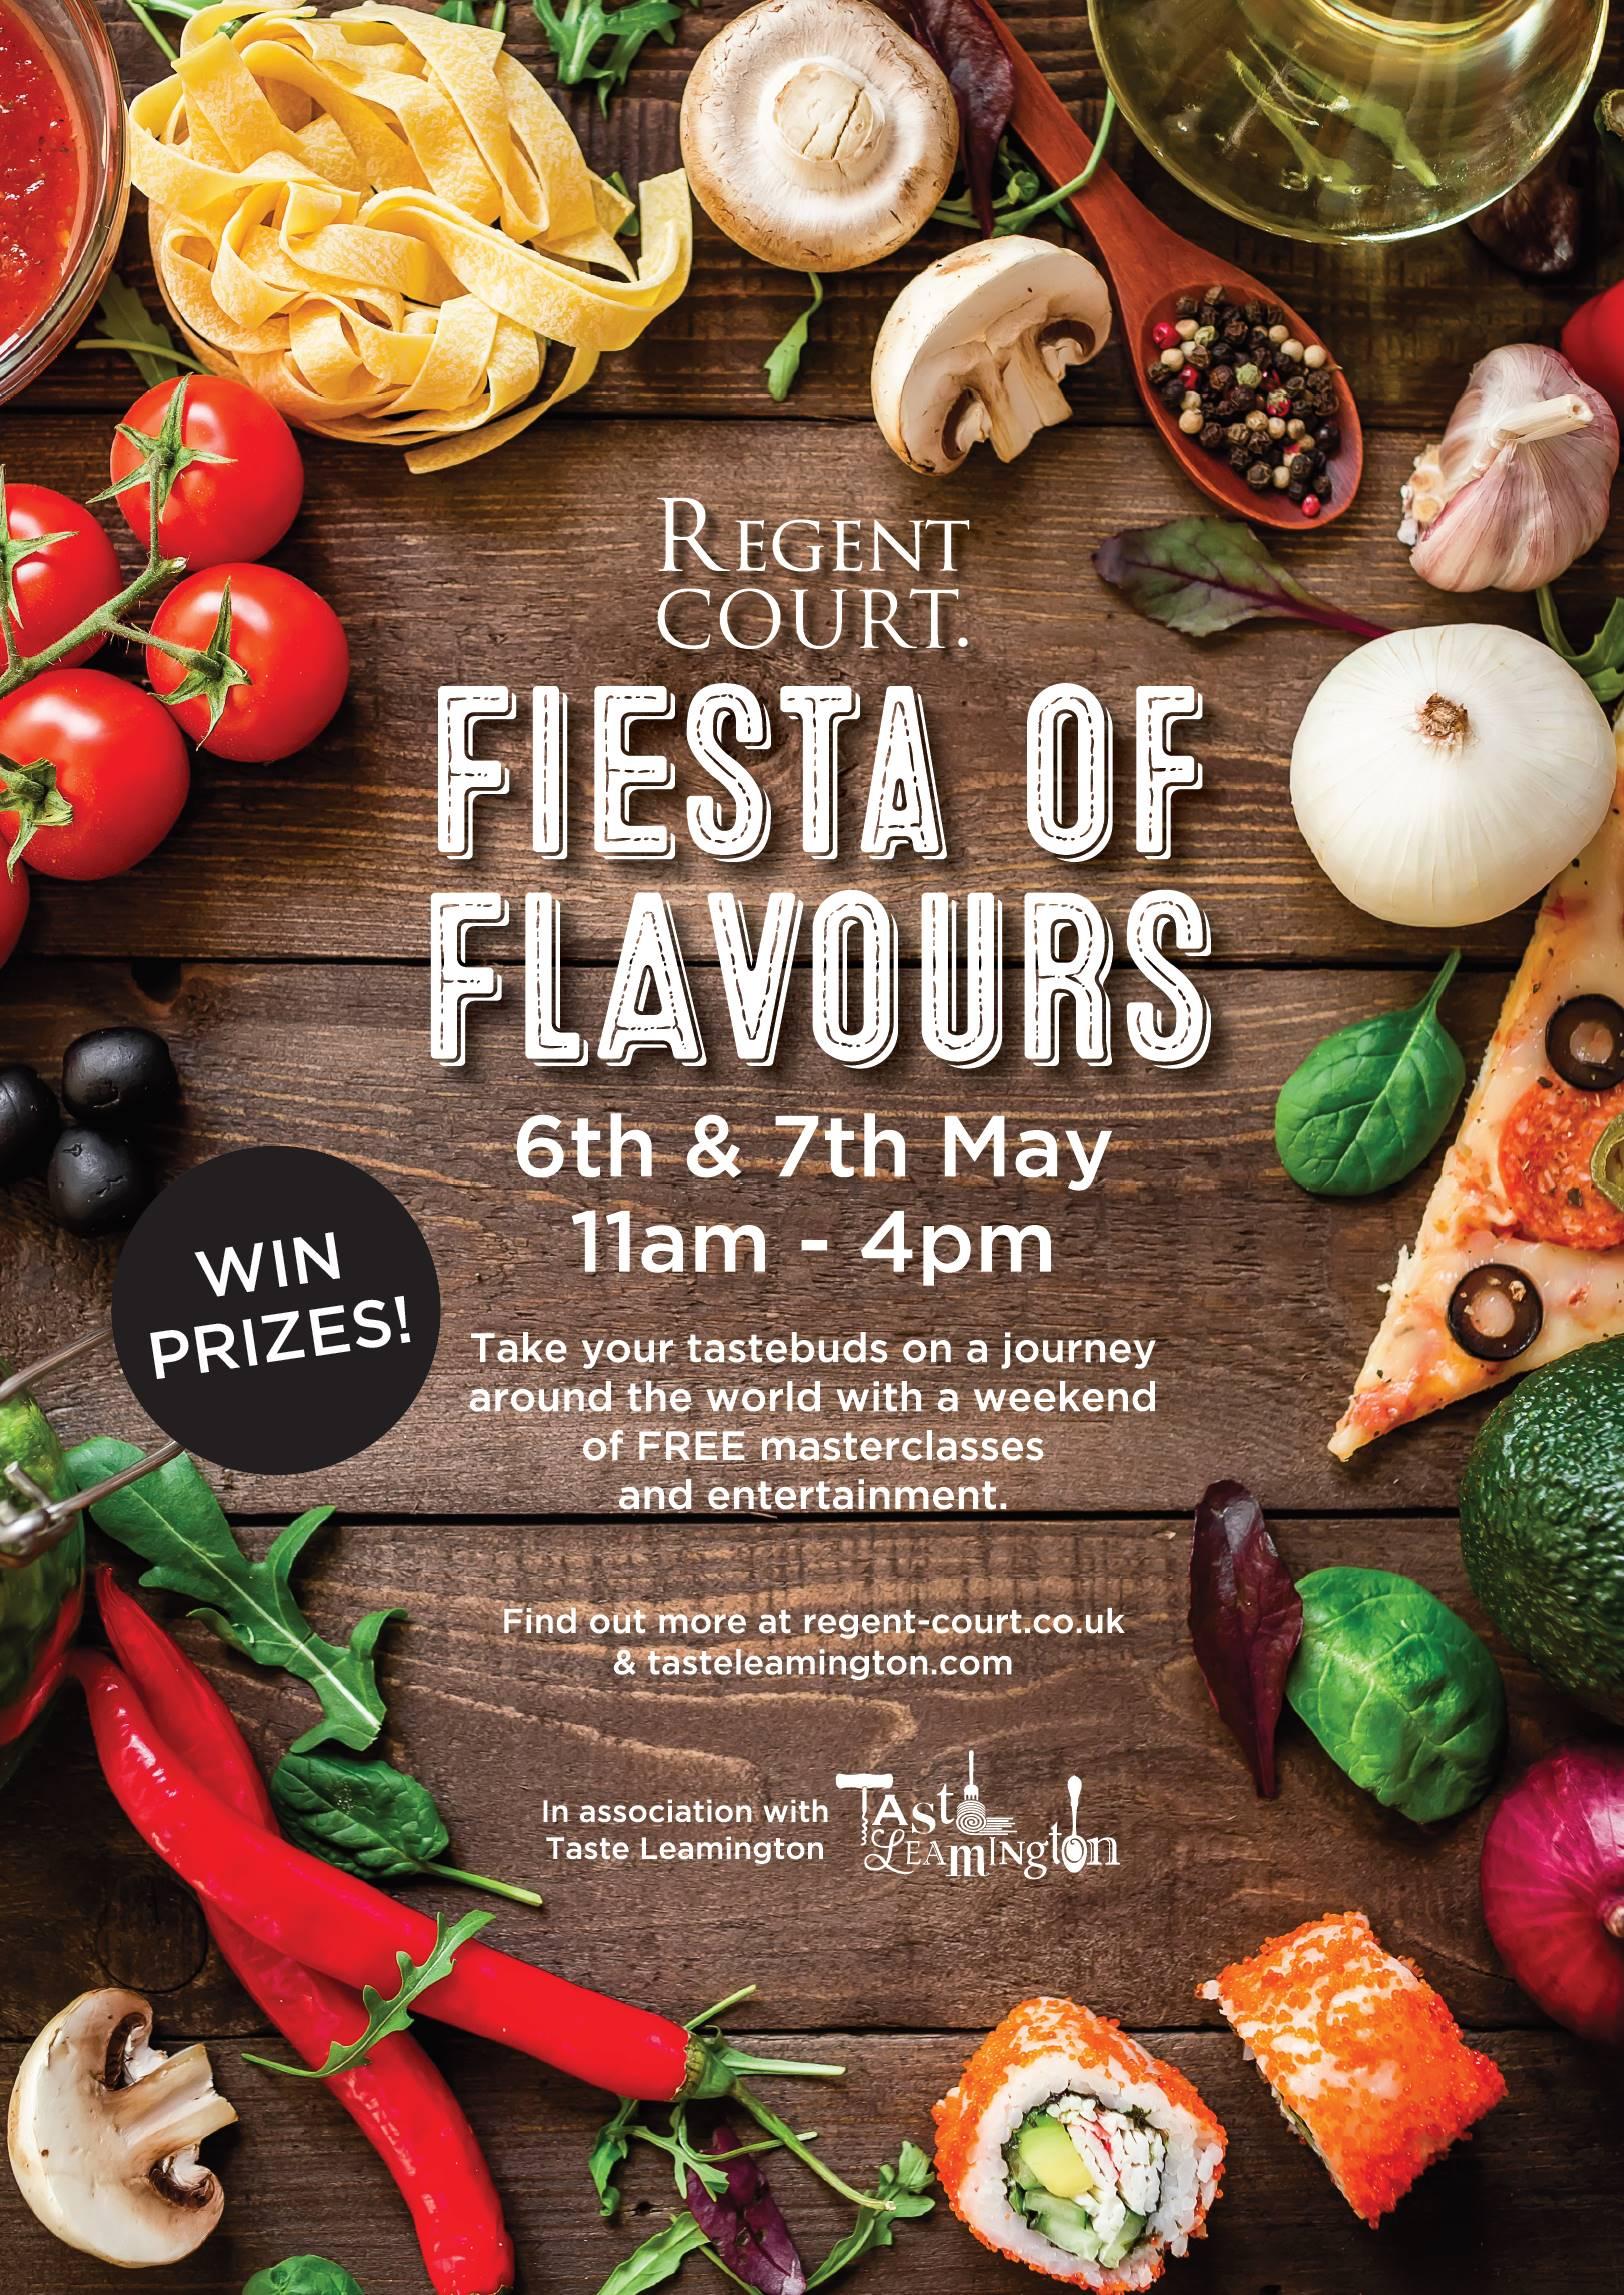 BW001387--Regent-Court---Fiesta-of-Flavours_A4